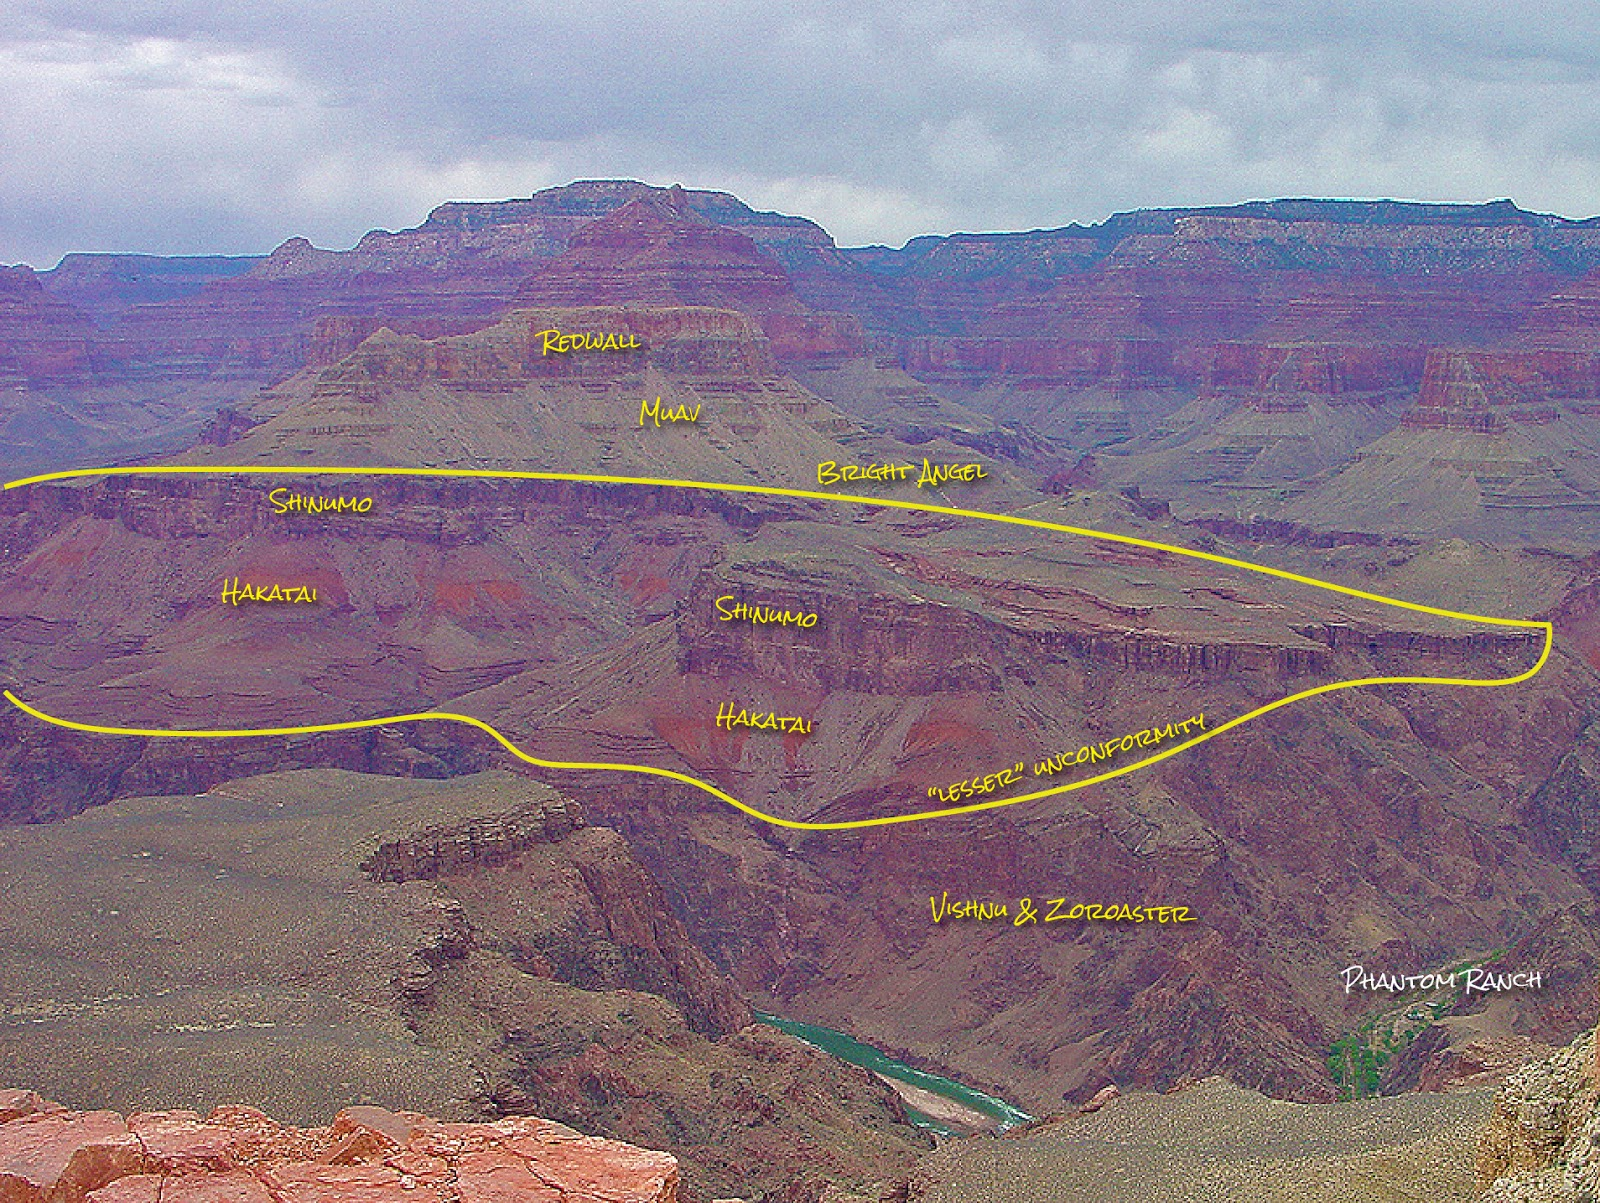 Grand Canyon National Park Arizona Bright Angel Trail south rim geology travel trip rocdoctravel.com